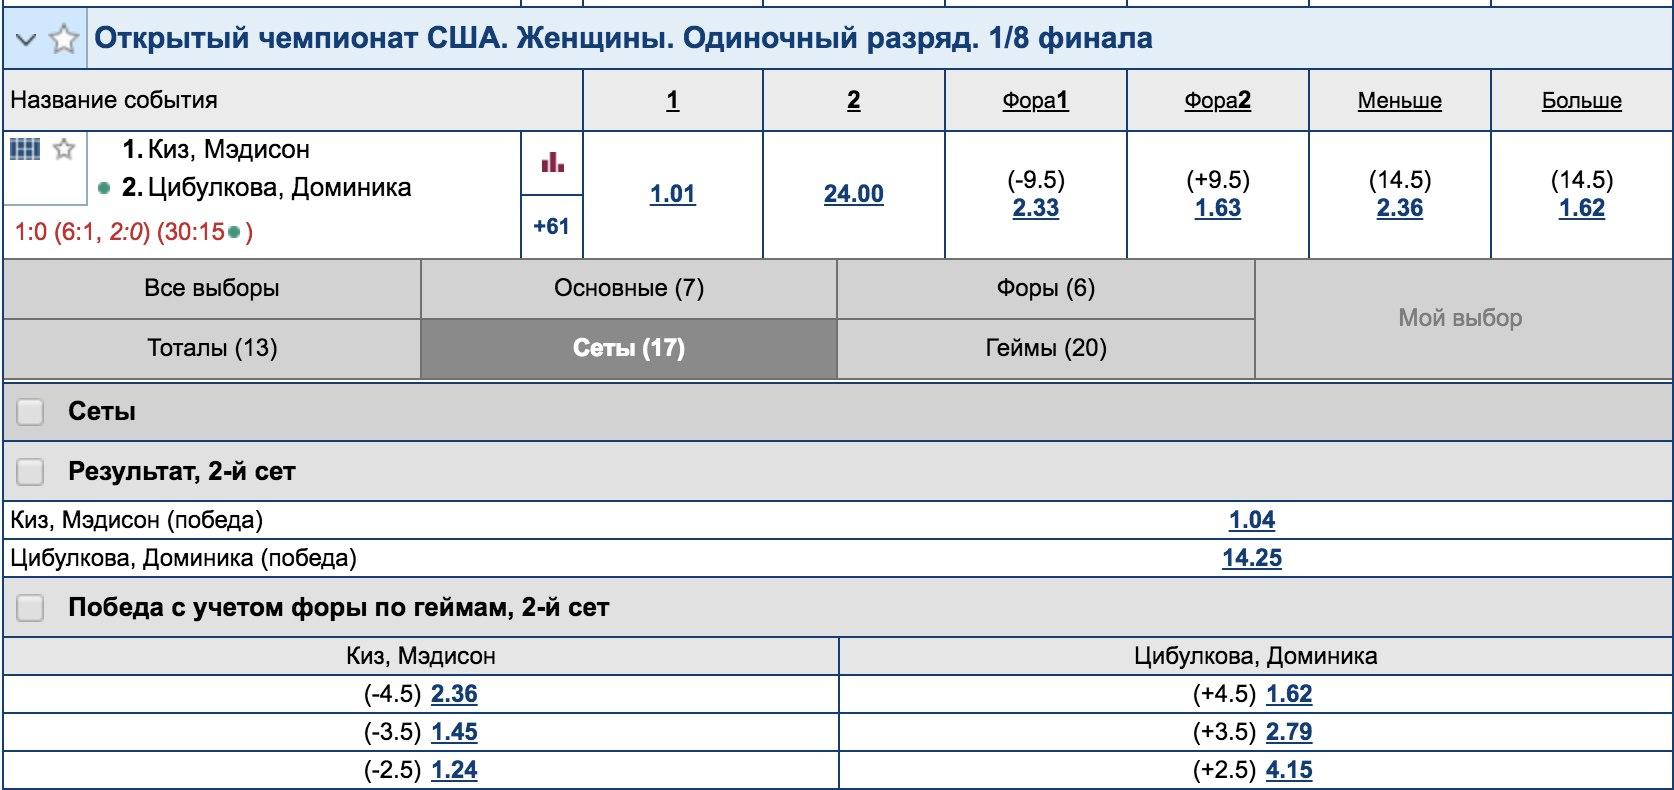 Прогноз на матч Киз М. - Цибулкова Д.: словачка выиграет с форой 5,5